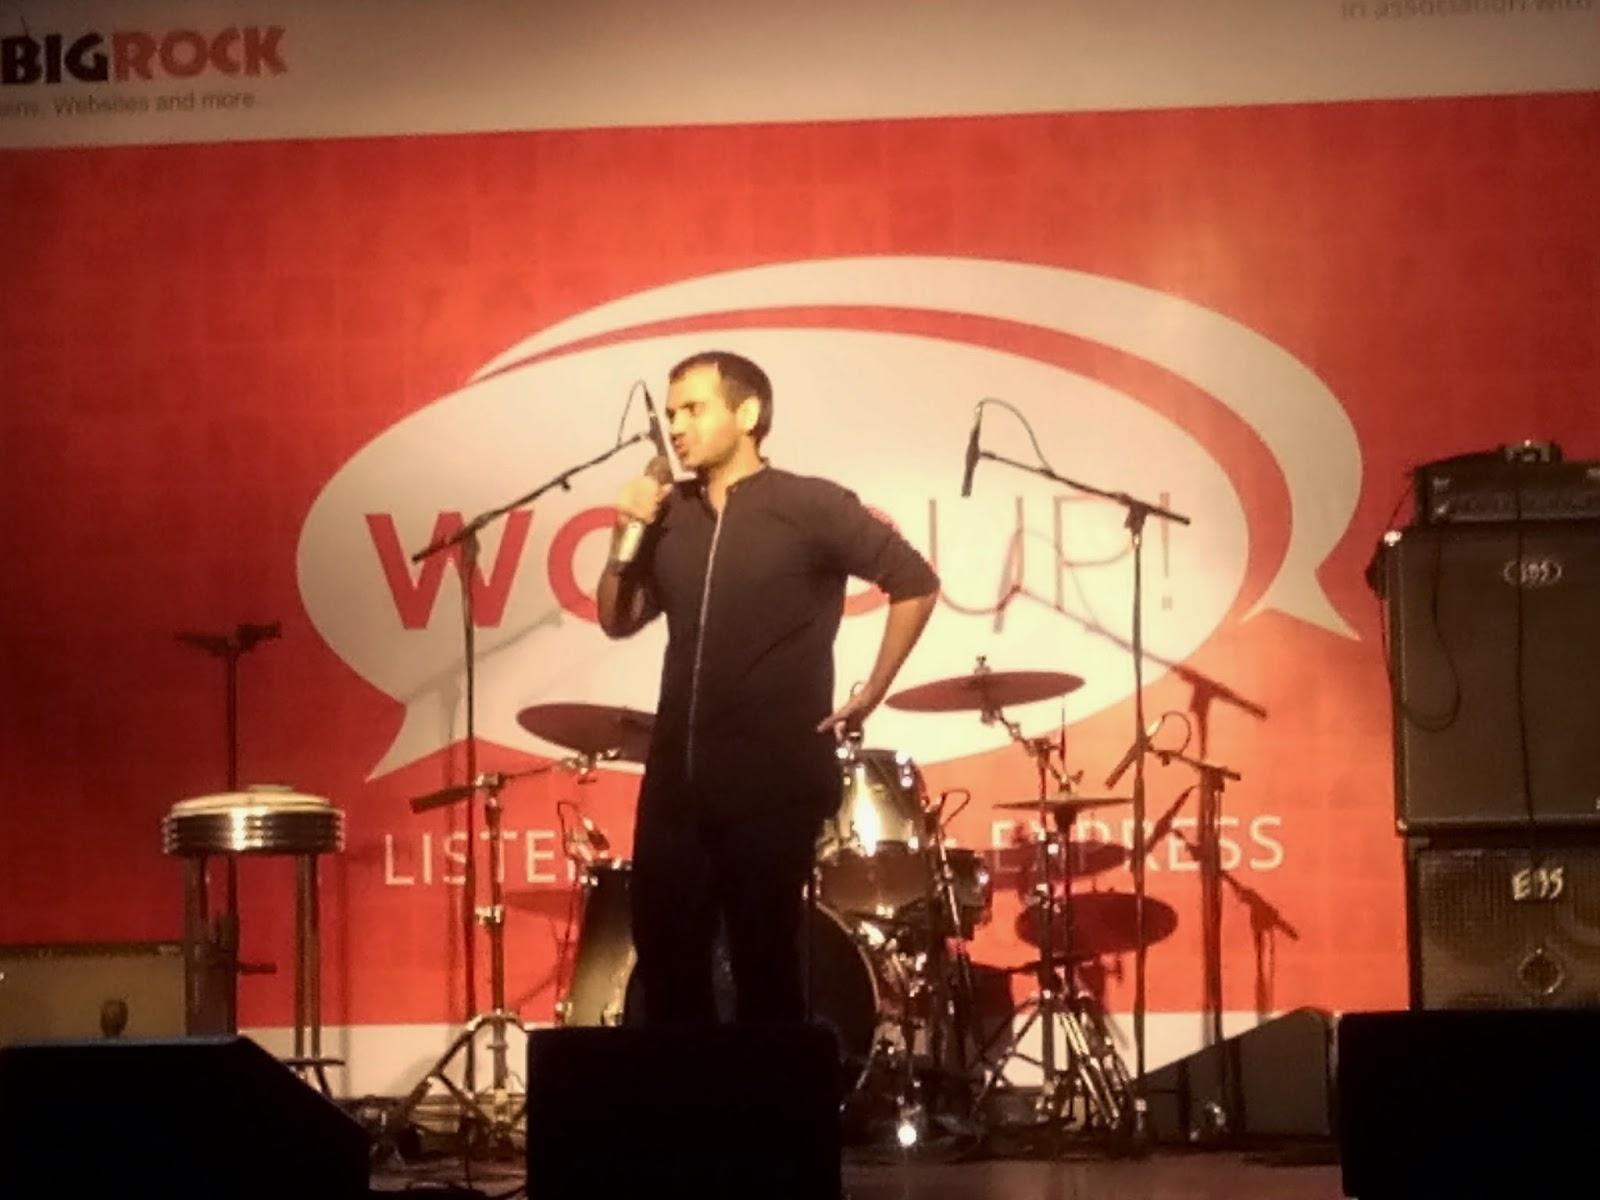 StandUp Comedy, BigRock, IndiBlogger, WordUp